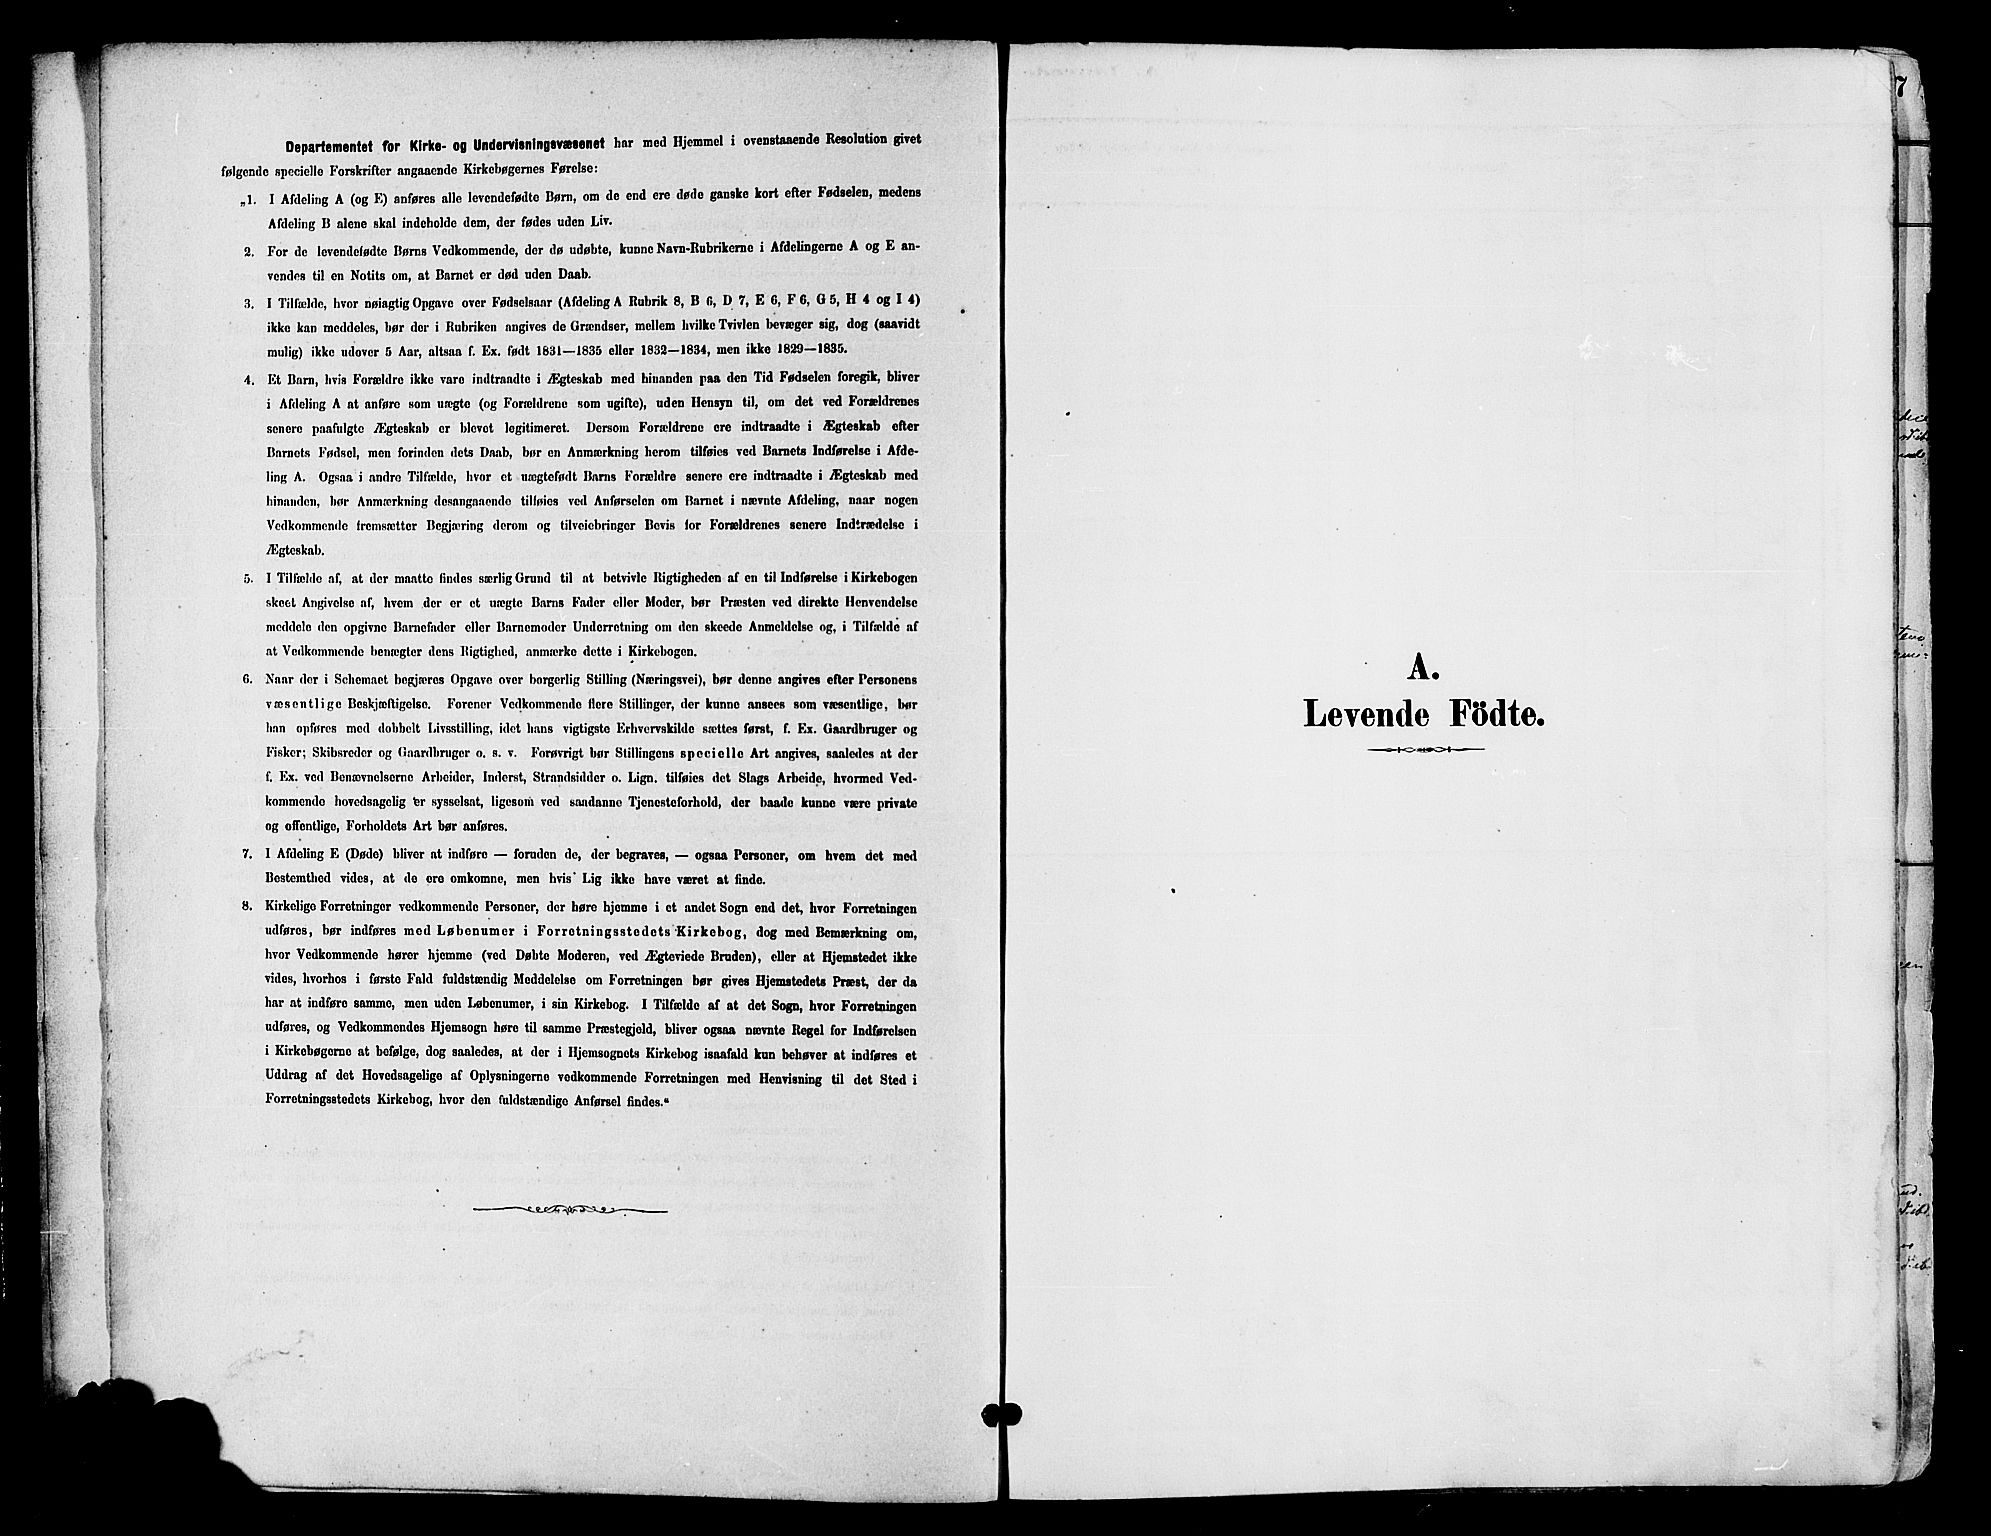 SAH, Østre Toten prestekontor, Ministerialbok nr. 7, 1881-1896